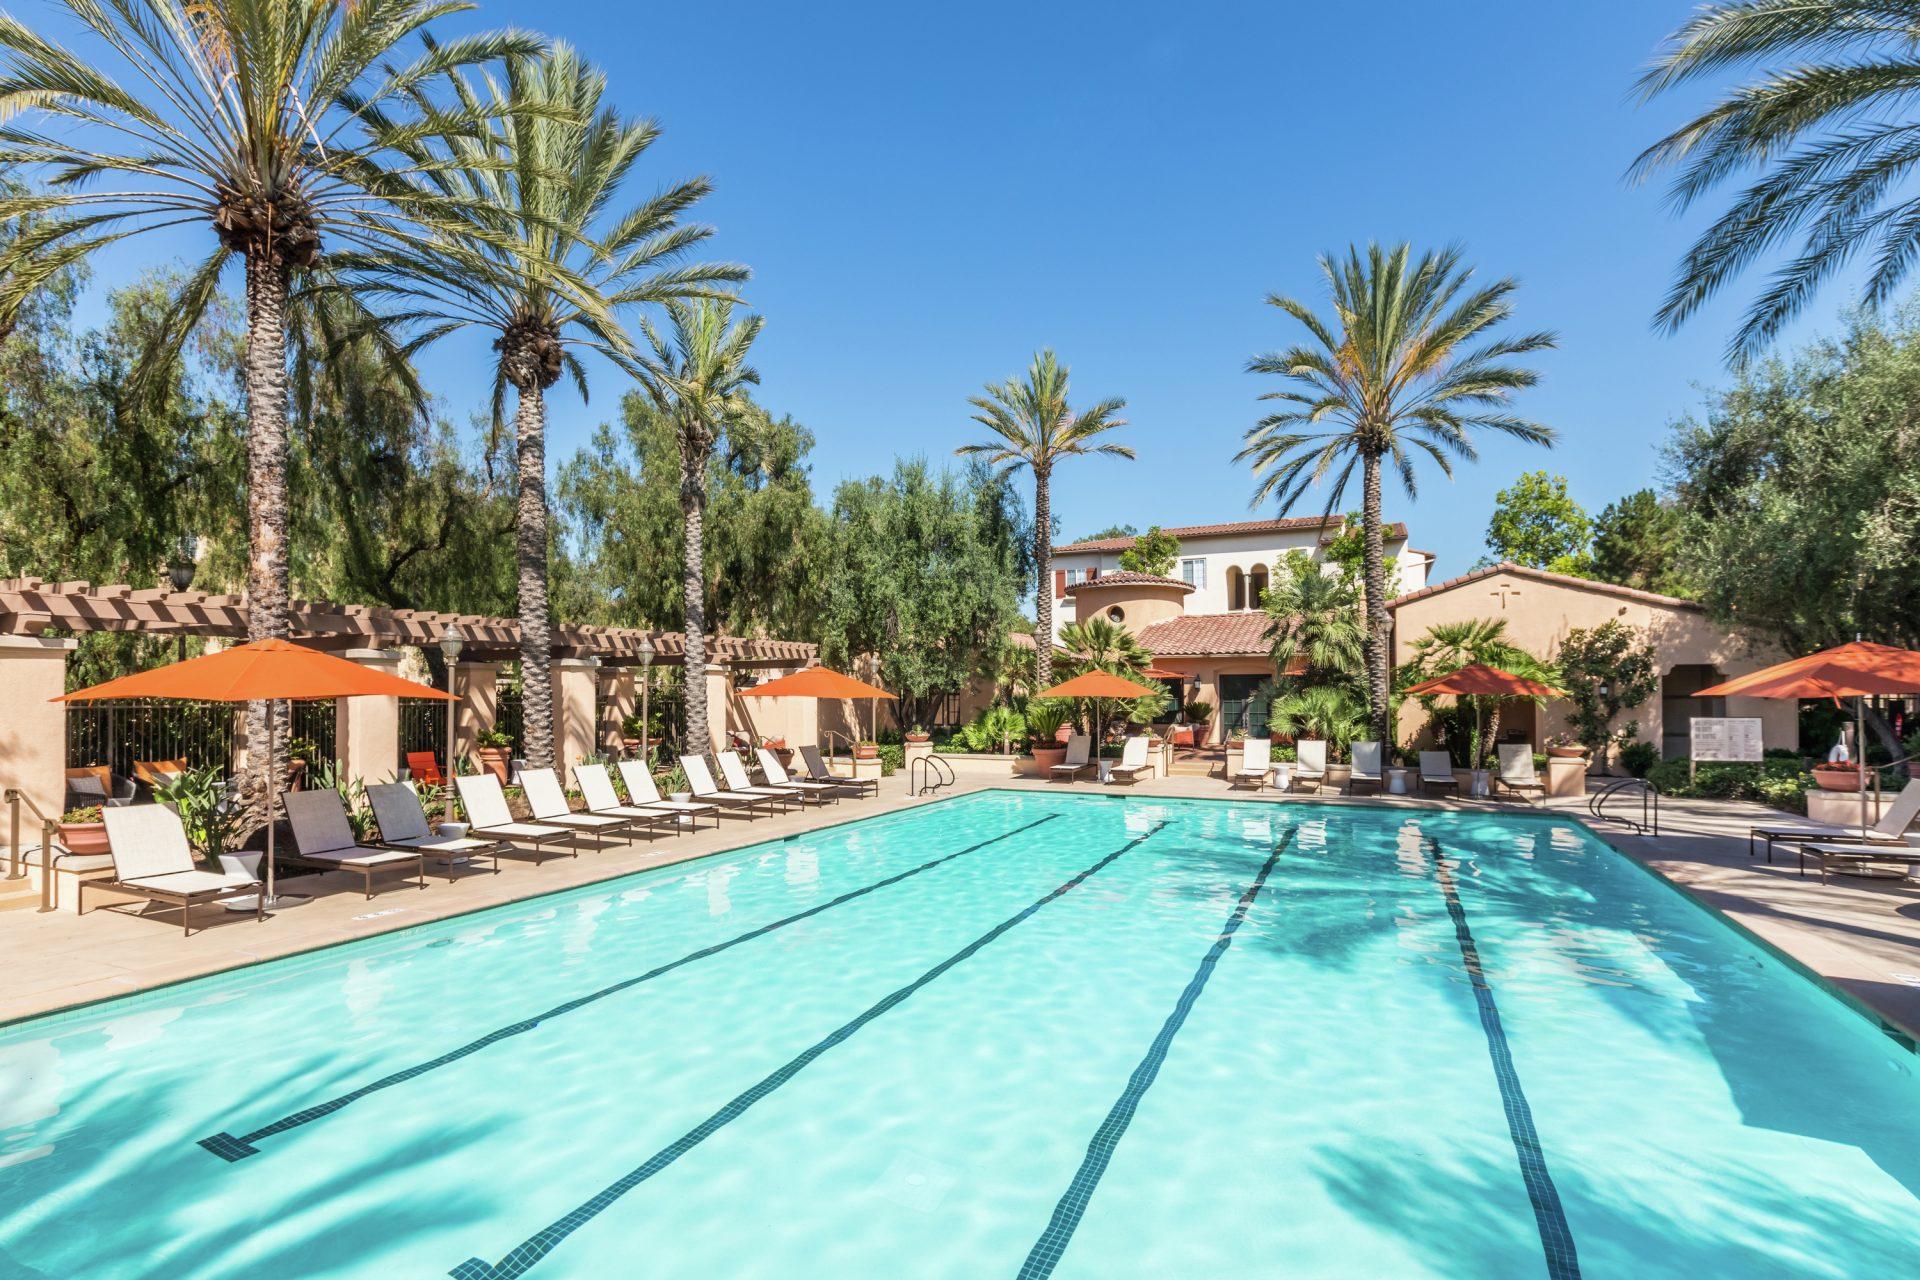 Anacapa Apartments at Irvine - 1 - 3 Bedroom & Studios